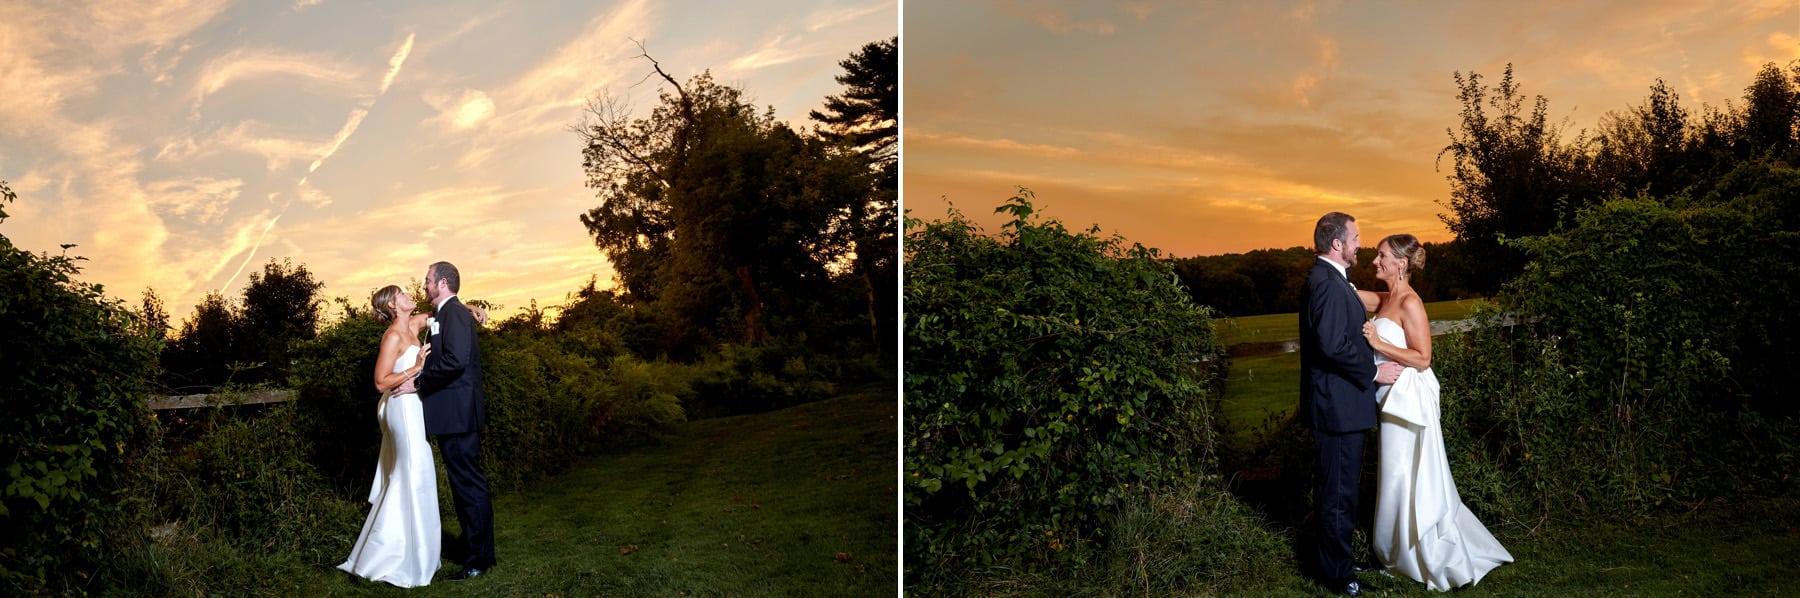 epic sunset wedding photo at basking ridge country club